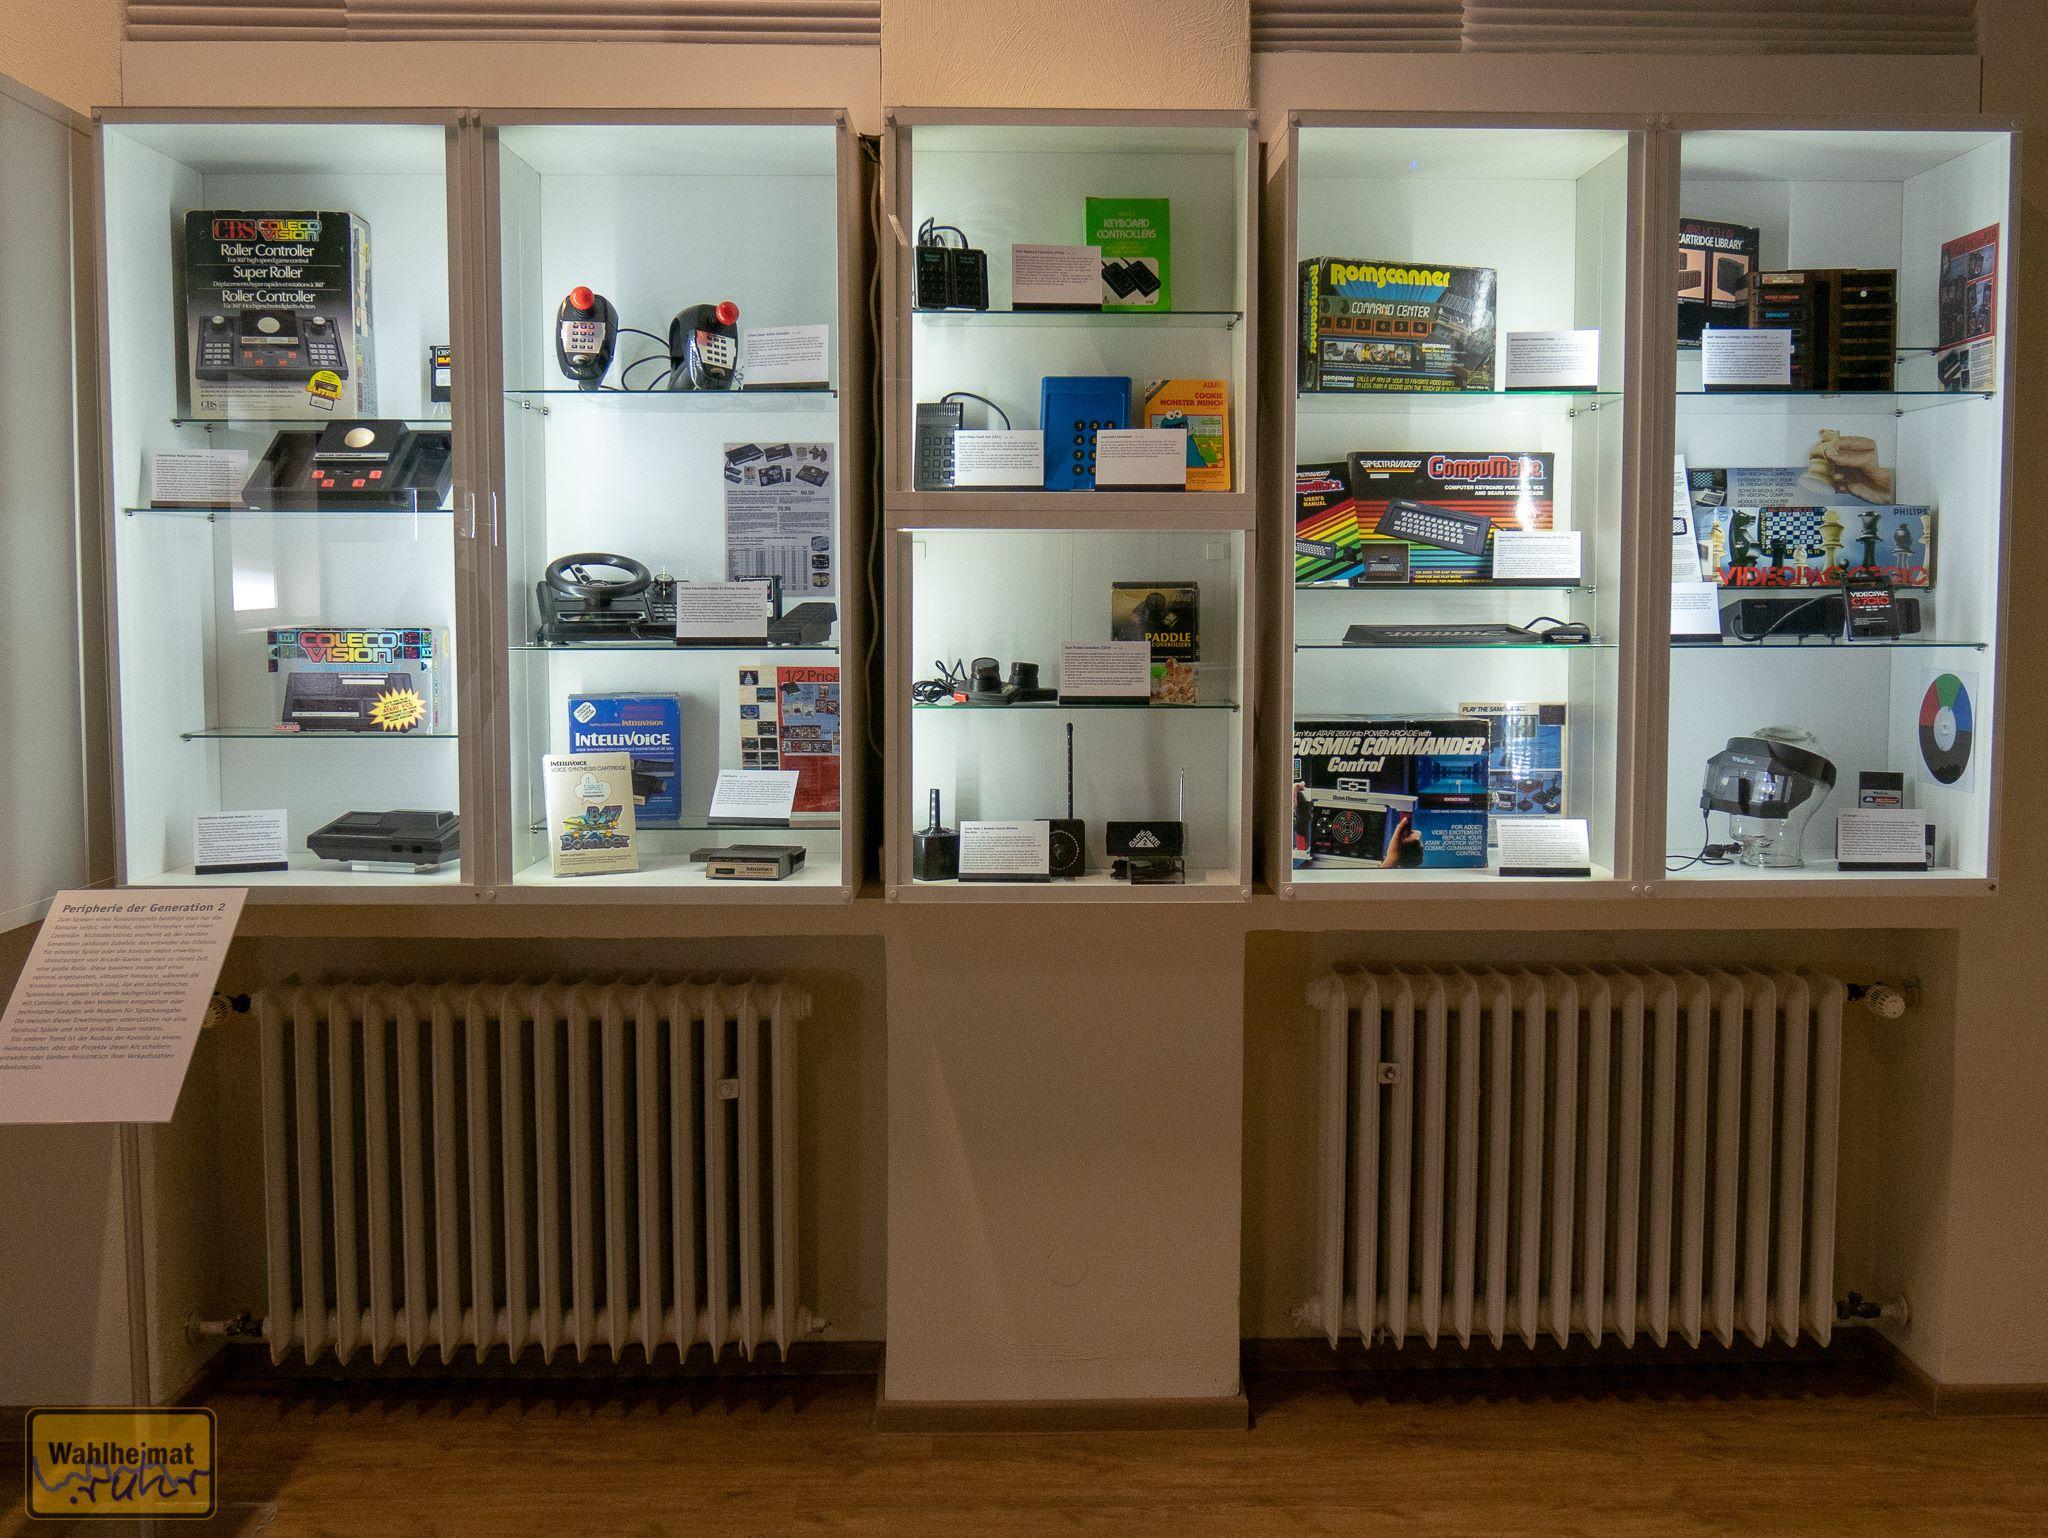 Spiele-Controller & Co.